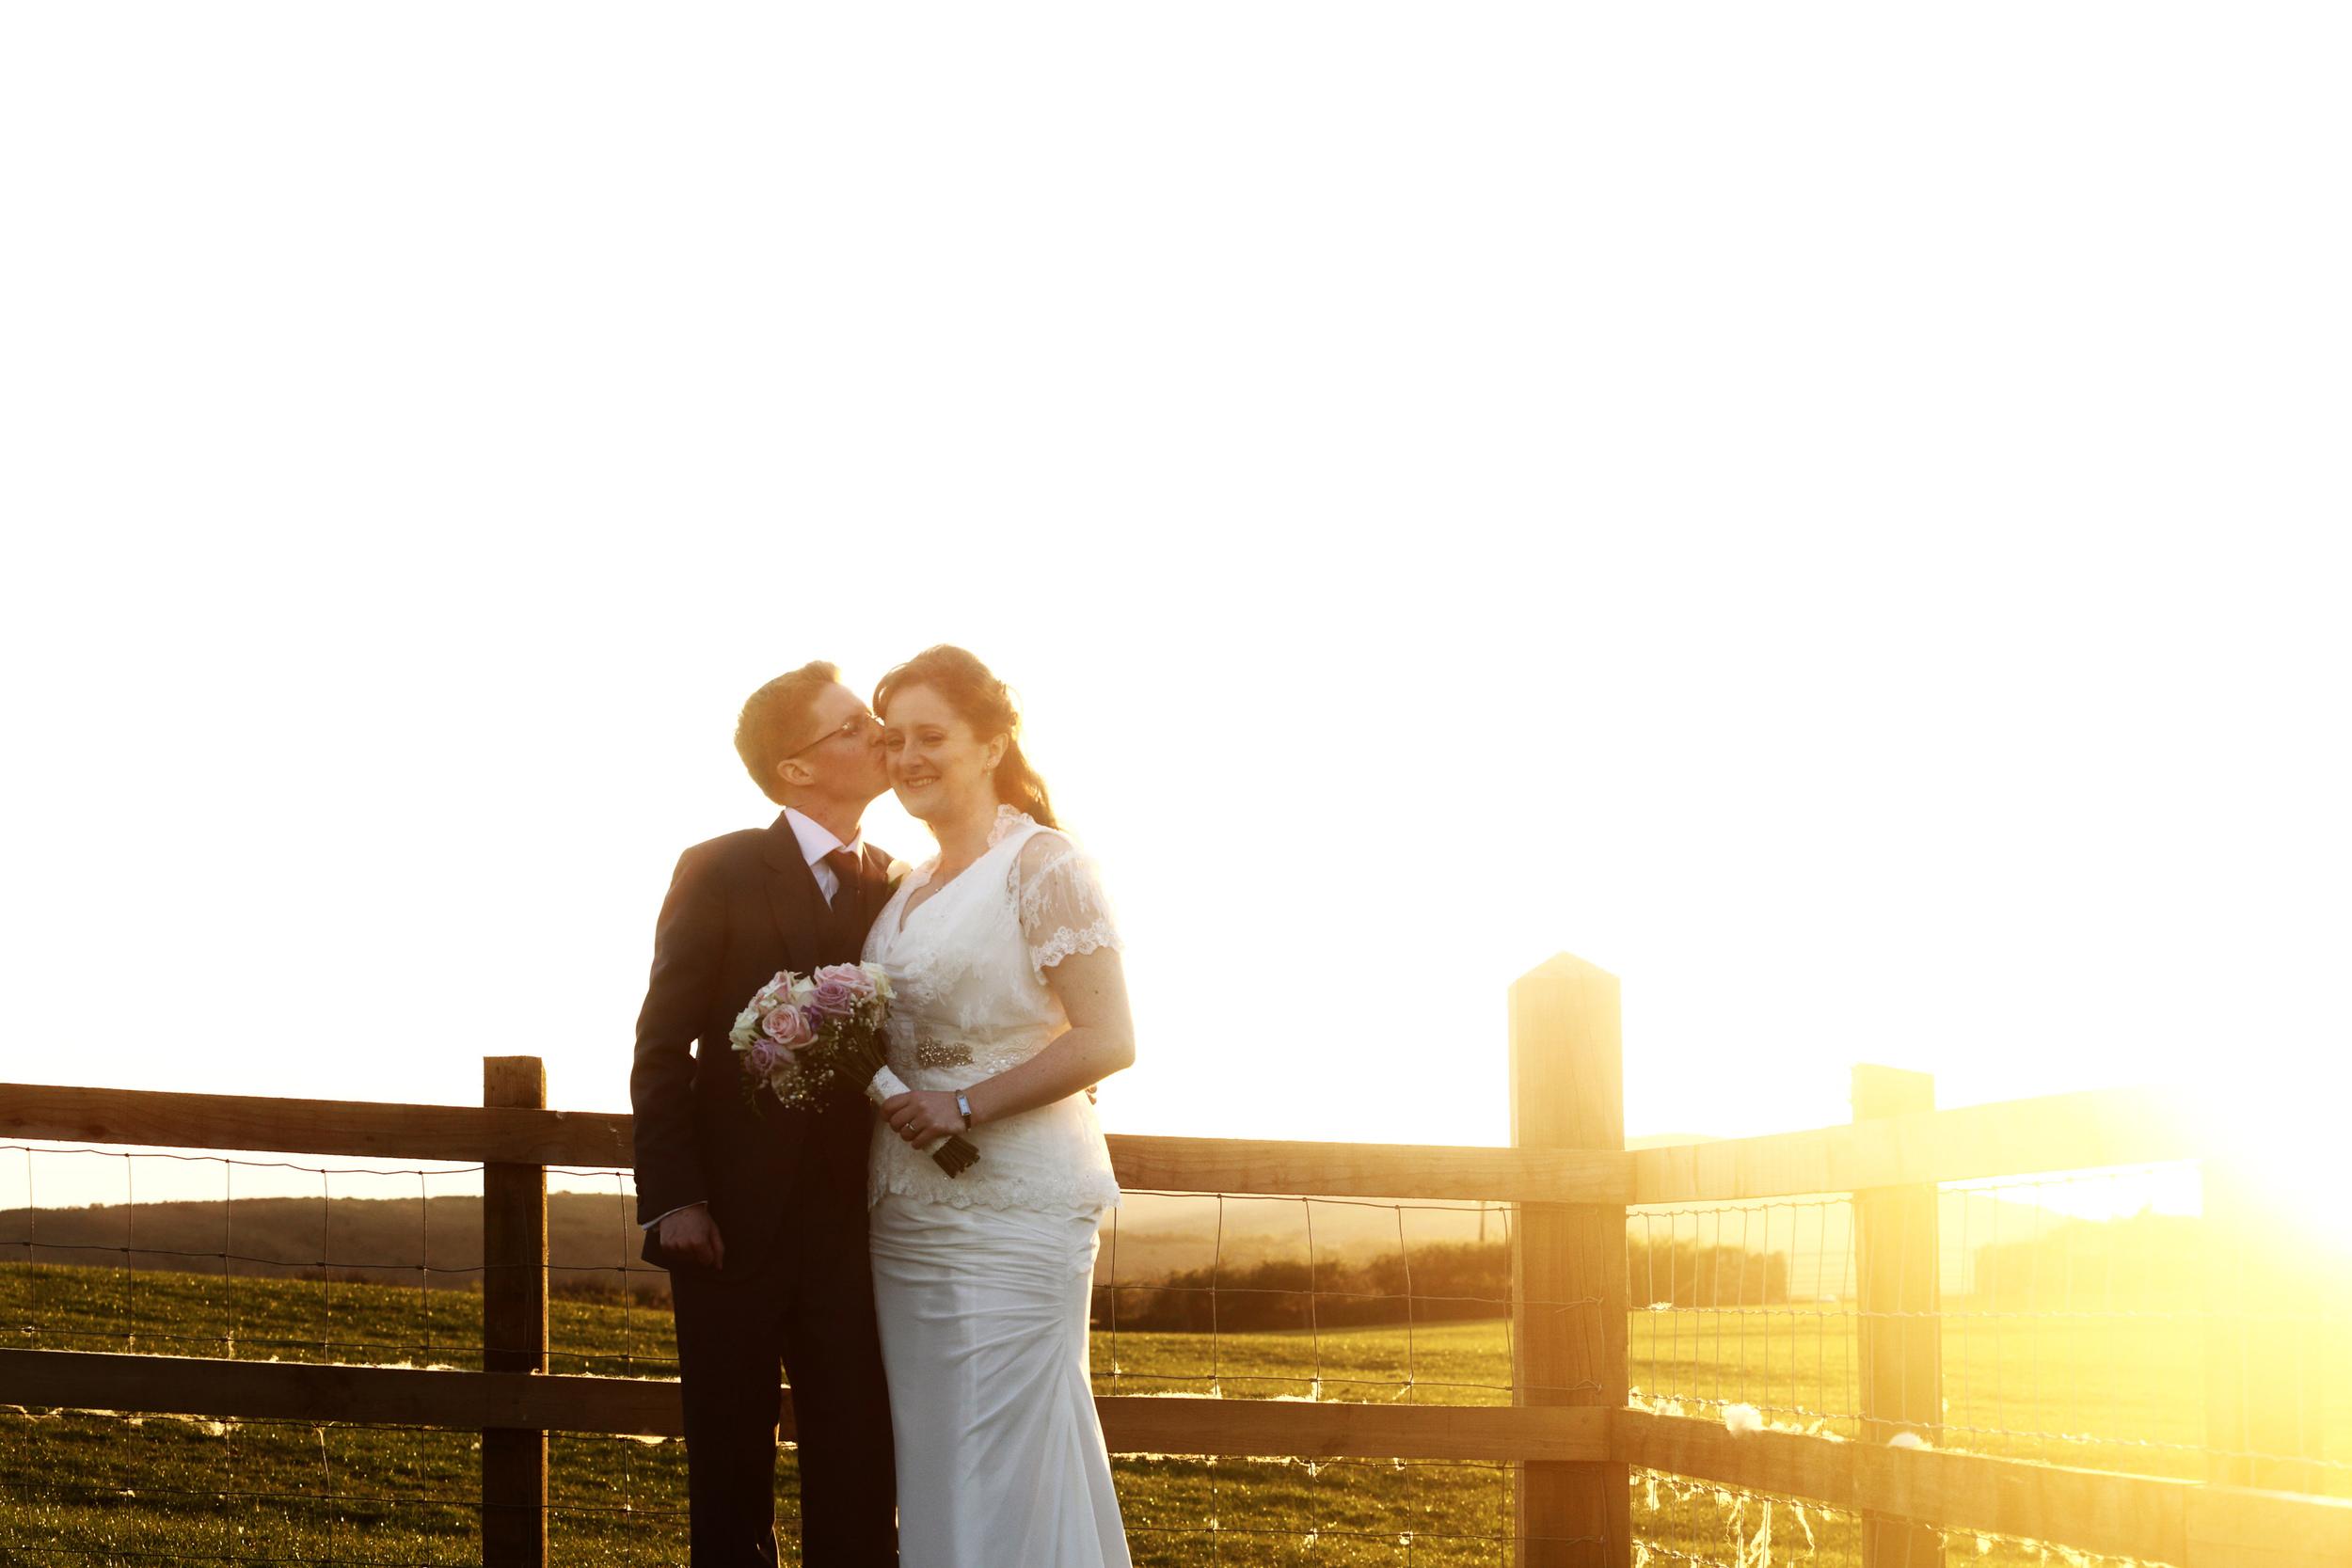 Ocean-View-Gower-Wedding-Photographer-068.JPG